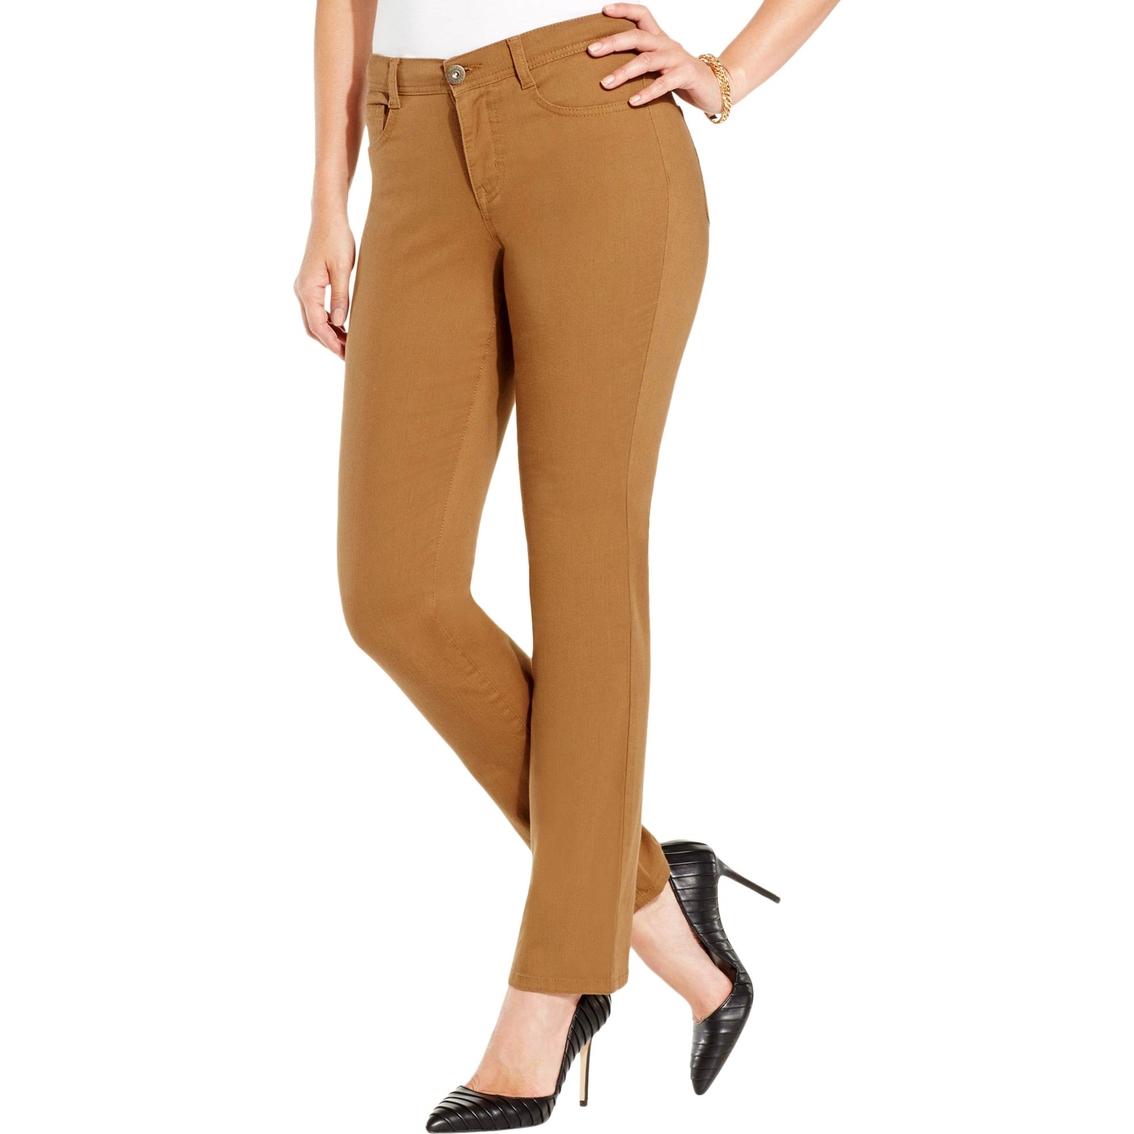 79afe3e07da Style & Co Petite Slim Leg Tummy Control Jeans | Jeans | Apparel ...